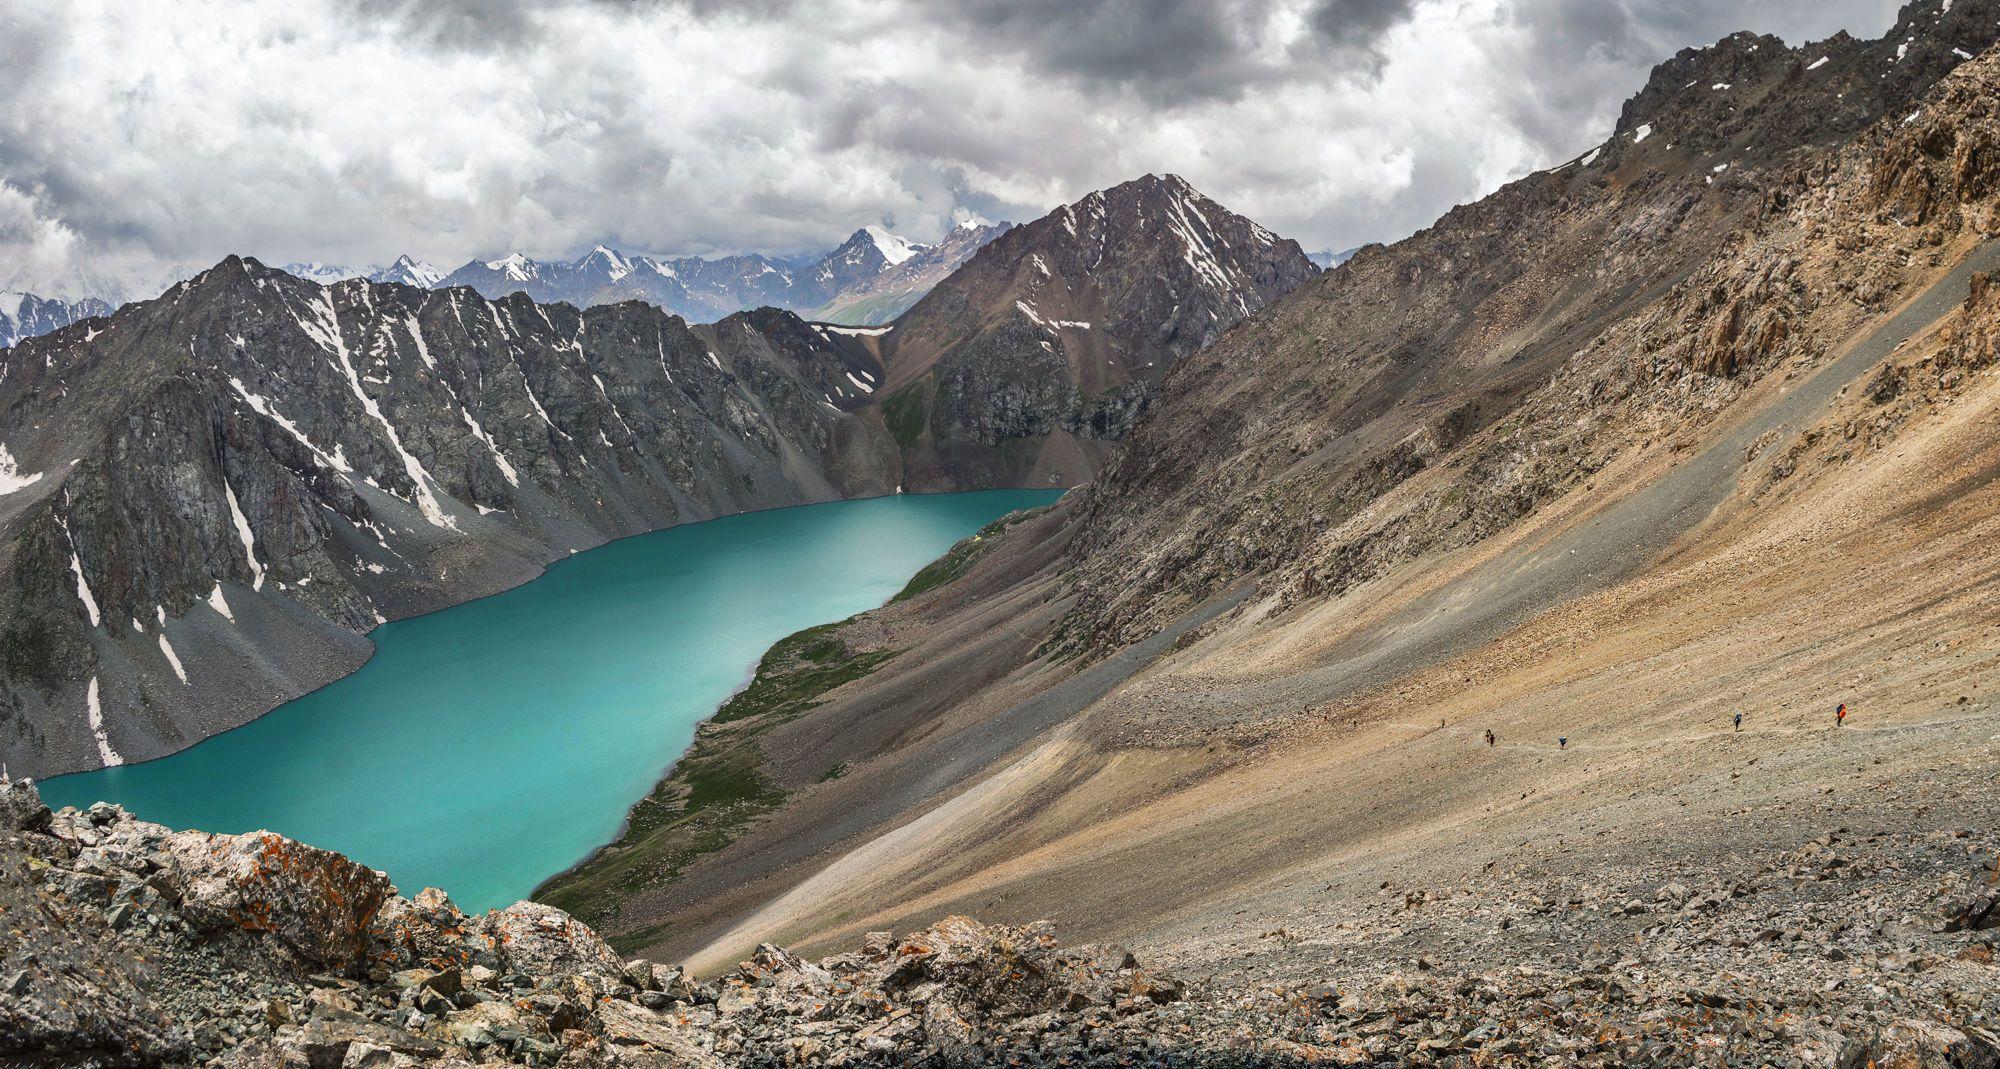 Киргизия. Озеро Тянь-Шань